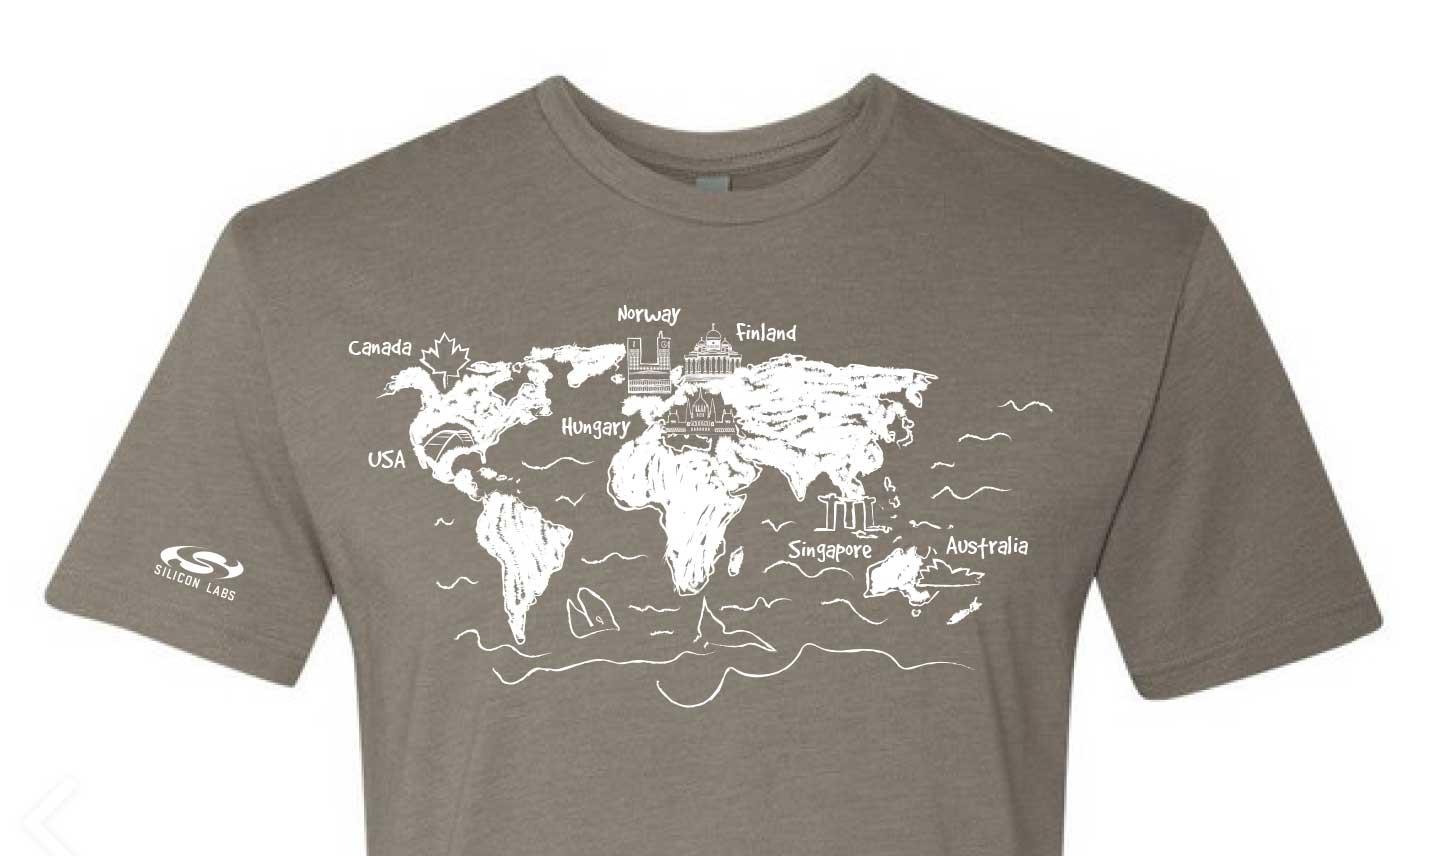 global internship t-shirt